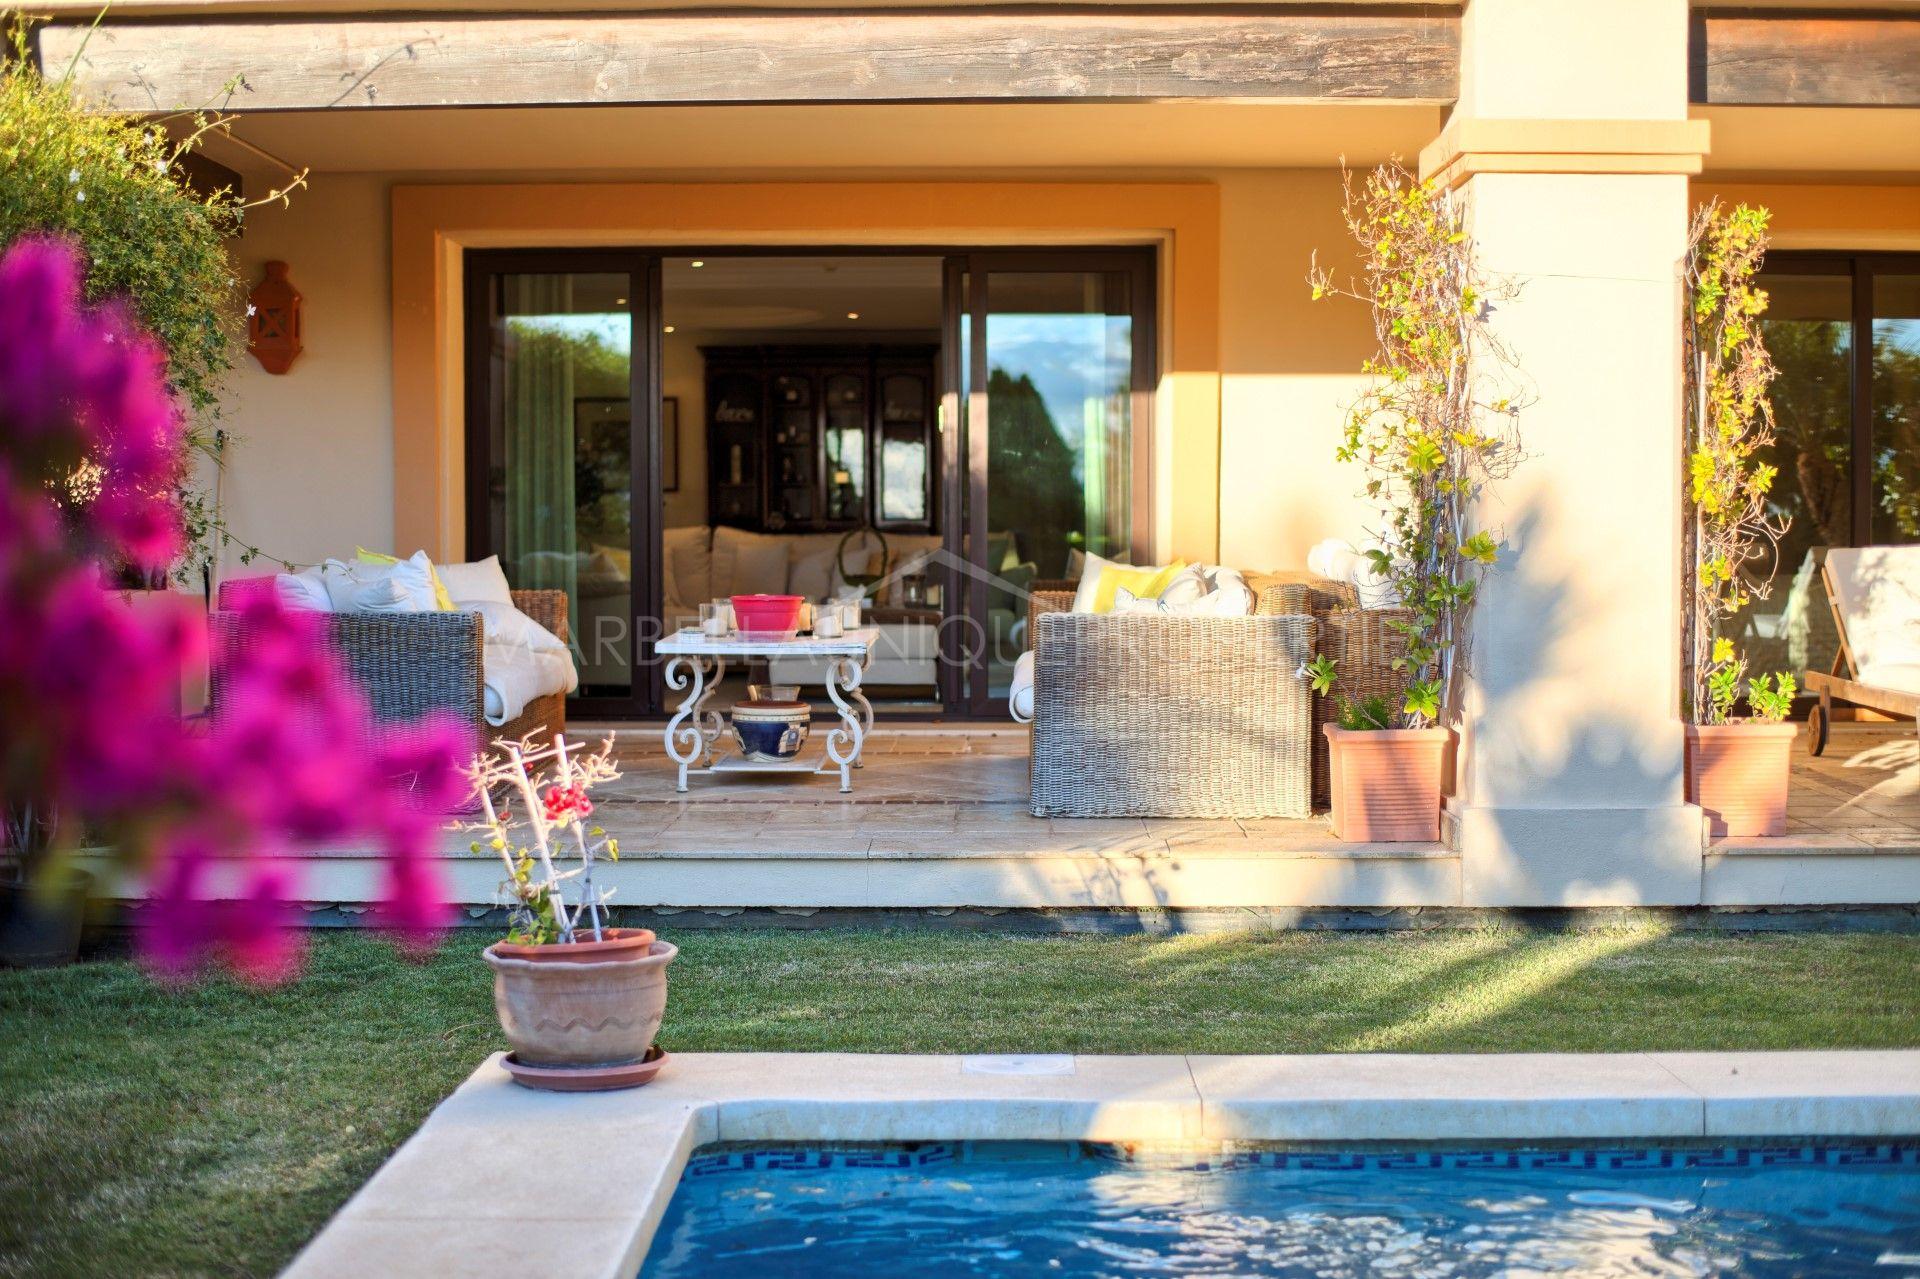 appartement rez de chauss e en vente aloha park marbella. Black Bedroom Furniture Sets. Home Design Ideas